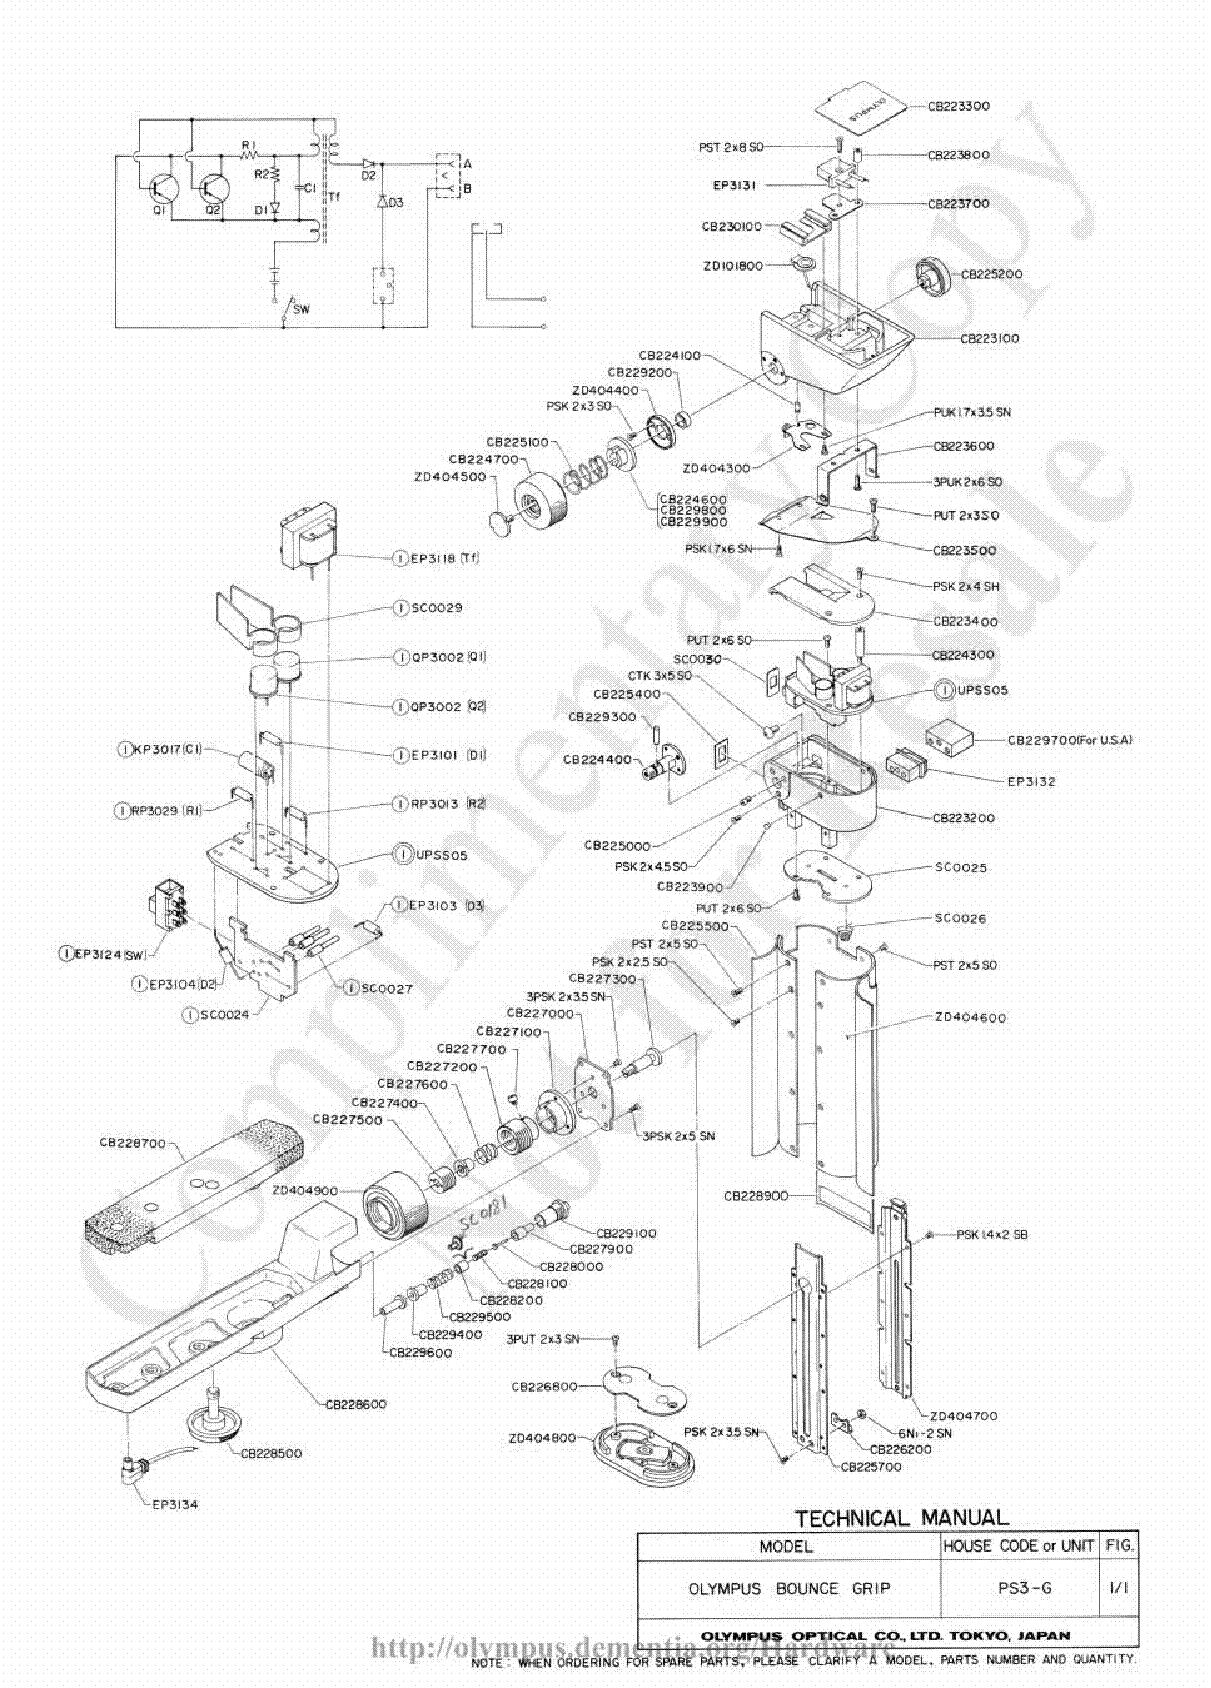 OLYMPUS C-460ZOOM D-580ZOOM X-400 PARTS LIST Service